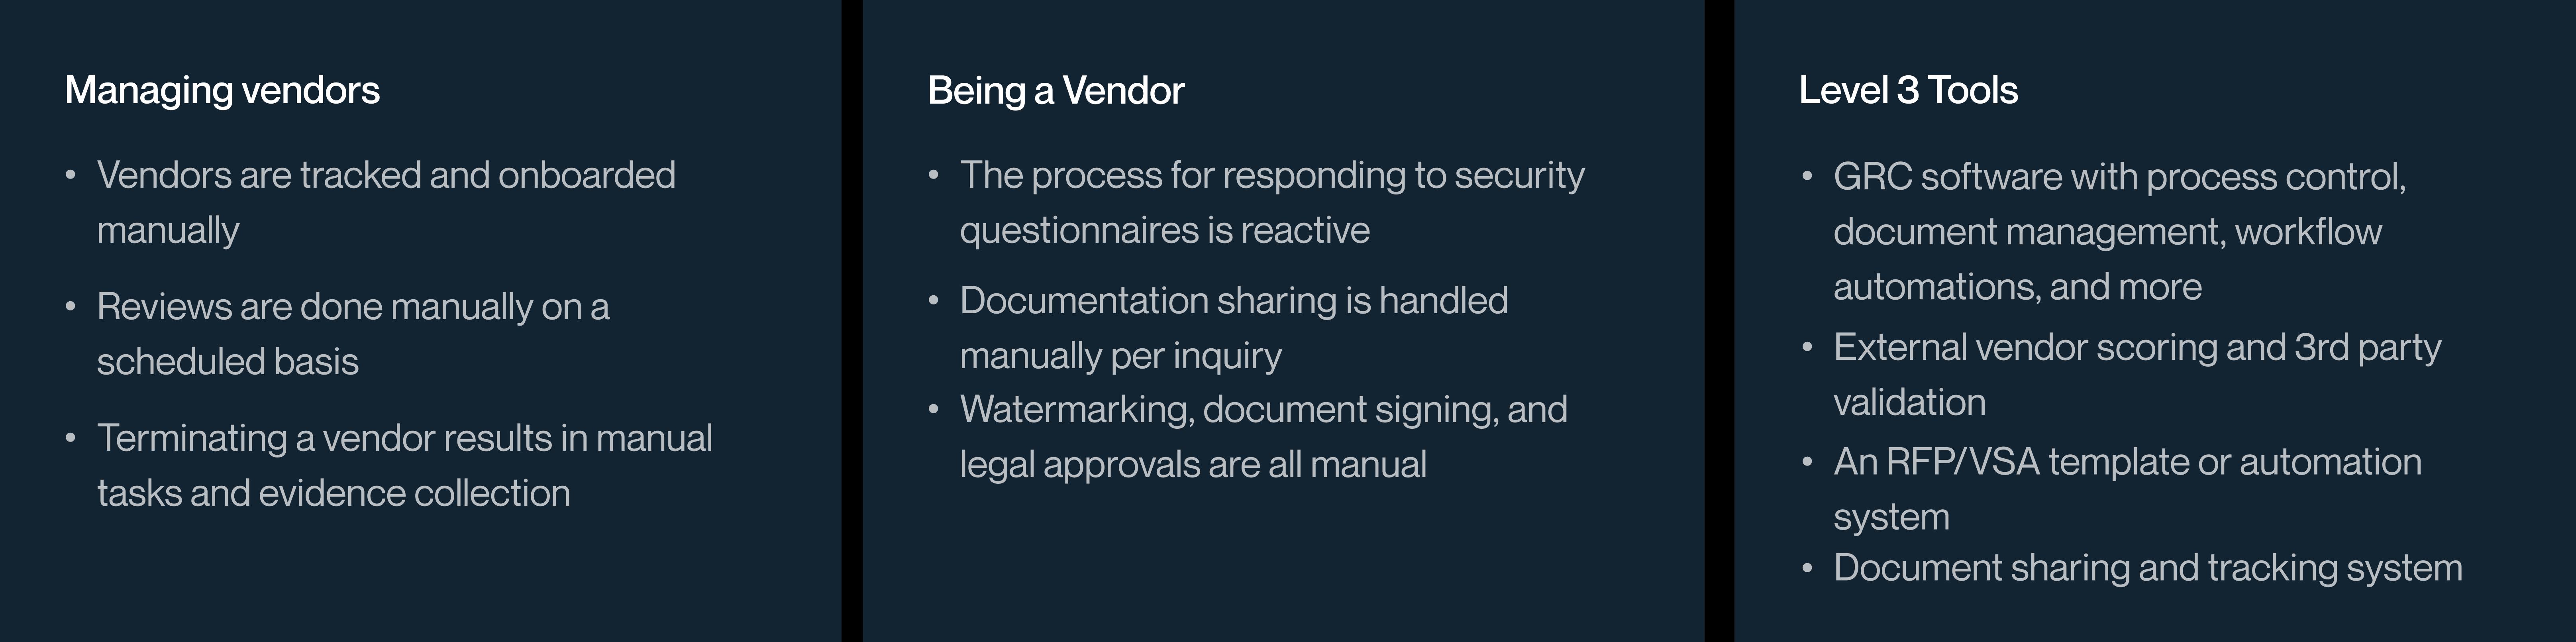 Vendor Management at Level 3